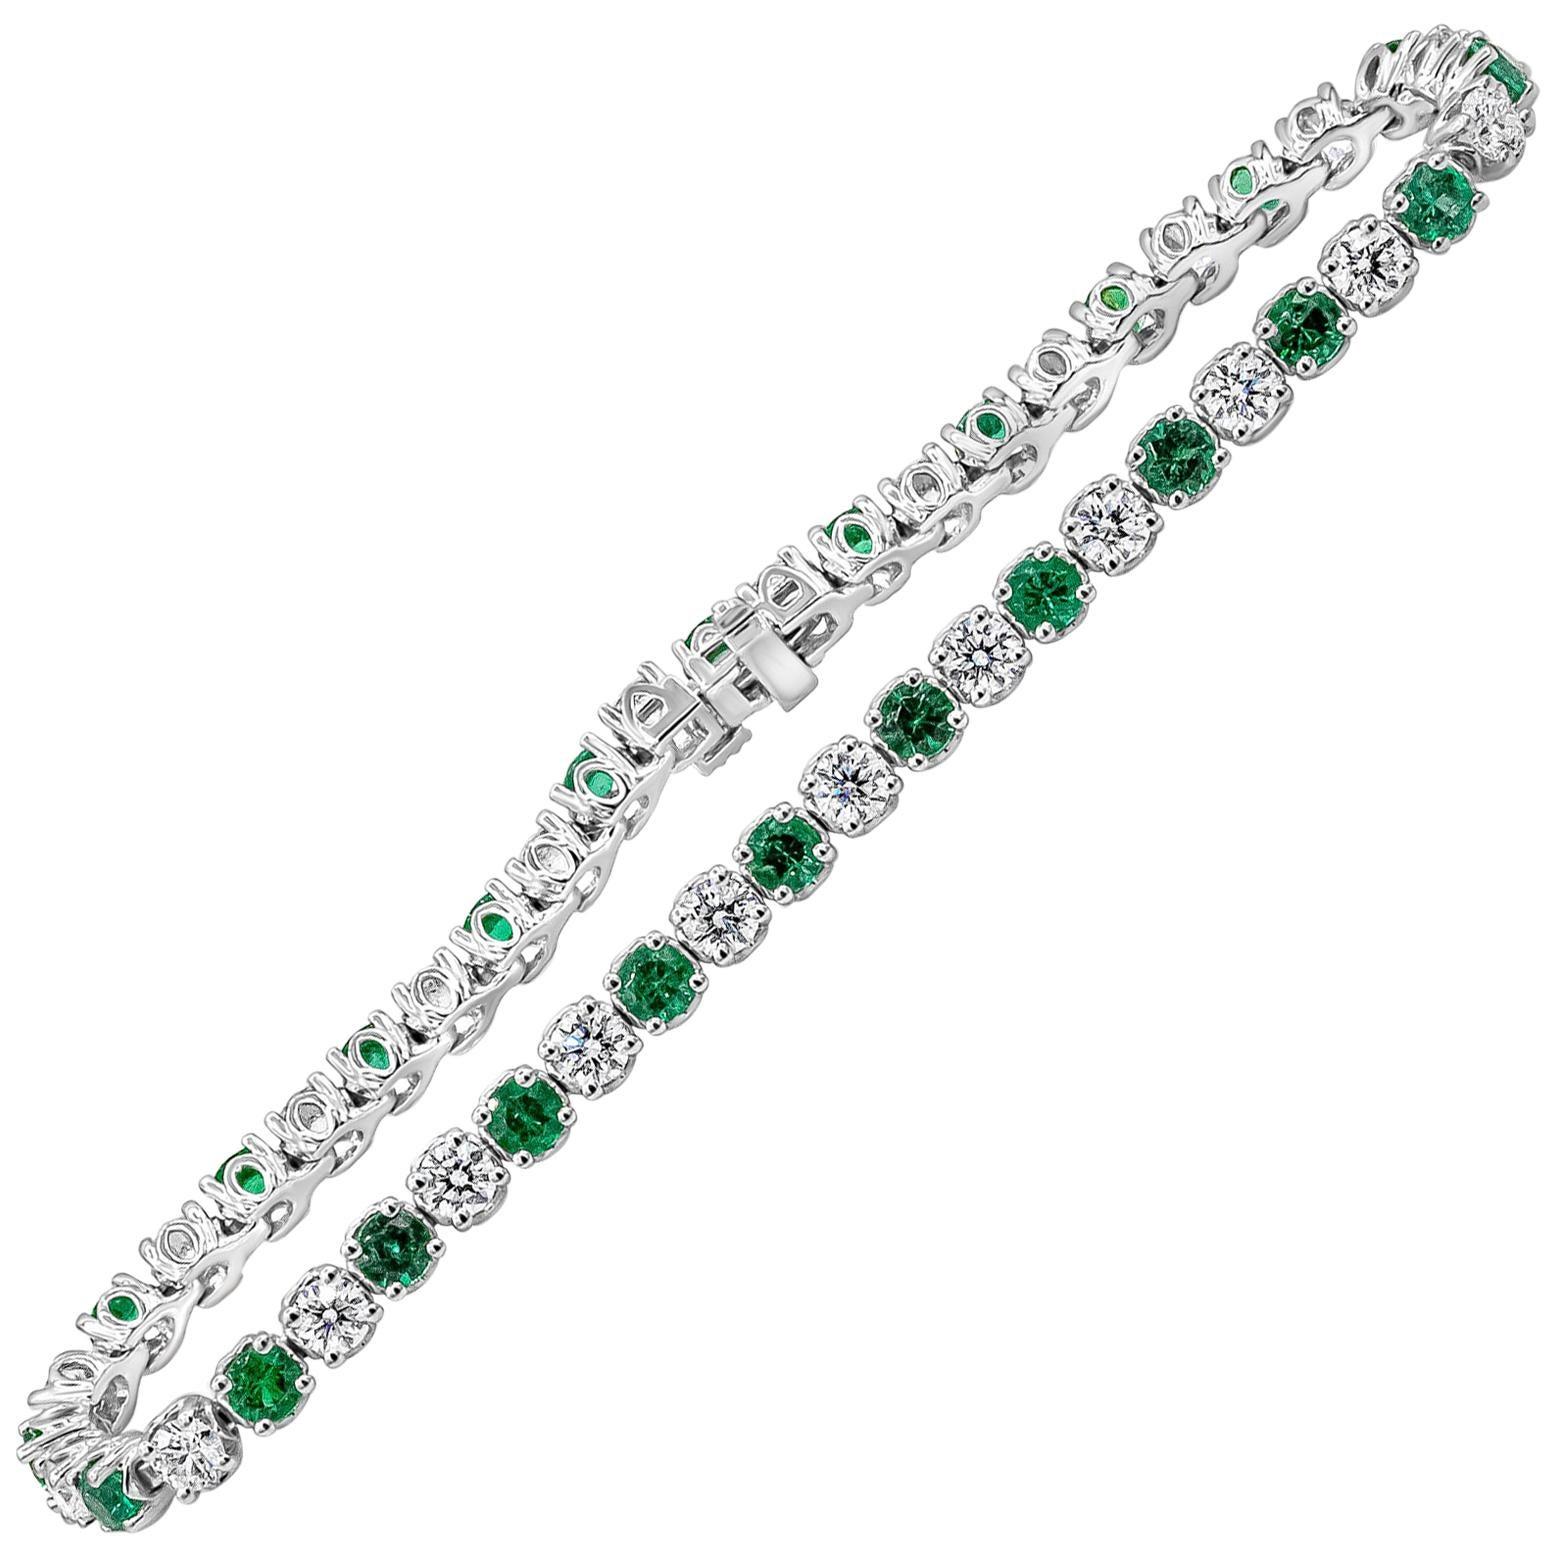 Roman Malakov Alternating Green Emerald and Diamond Tennis Bracelet